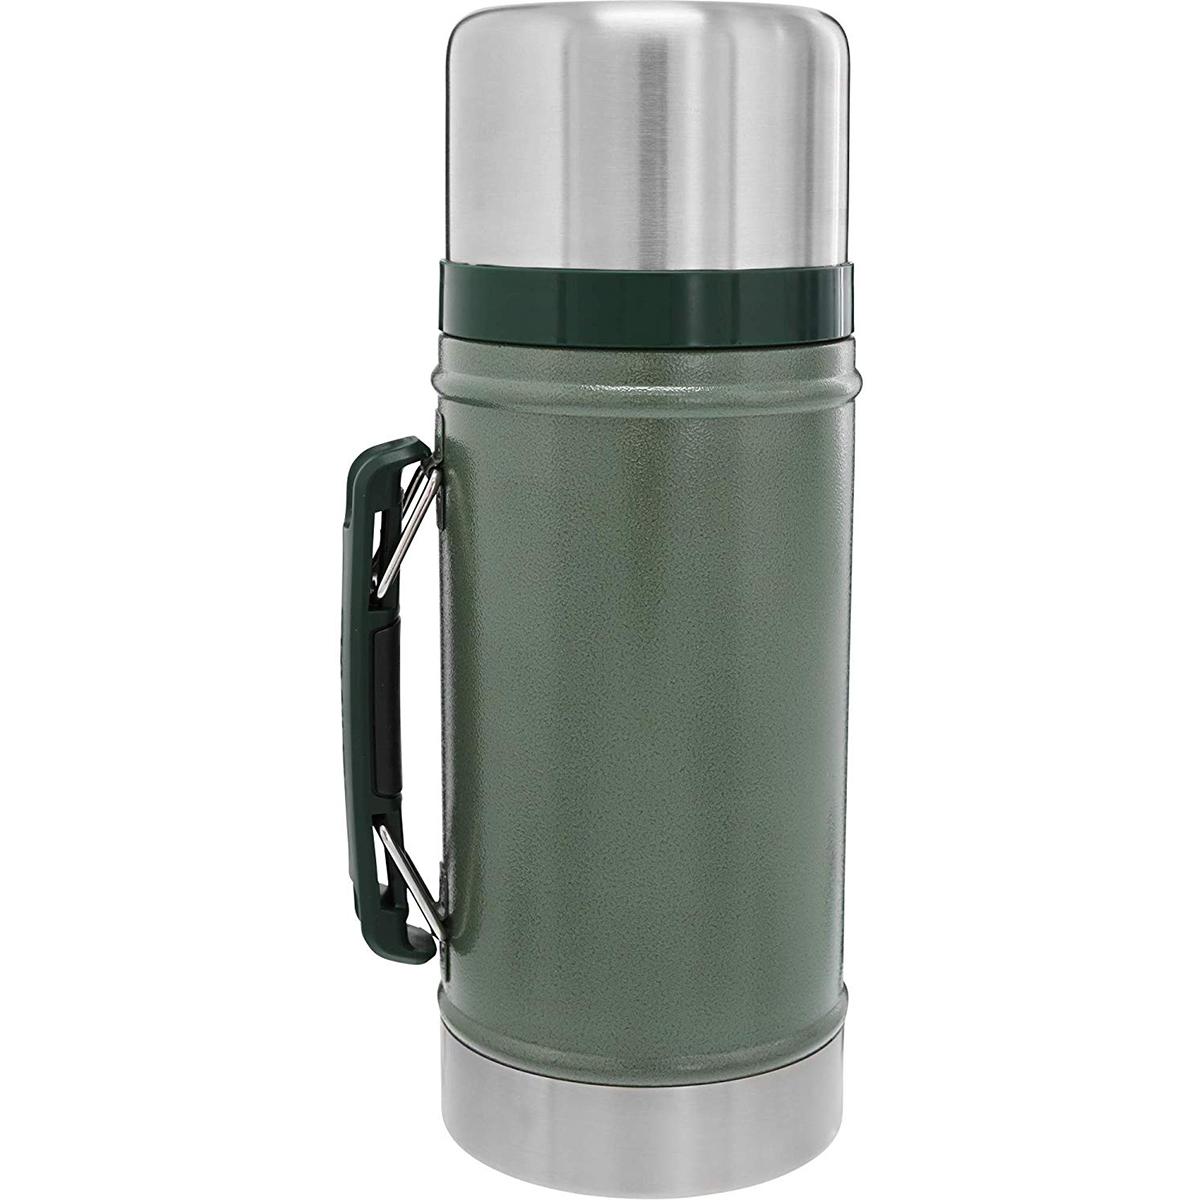 Legendary Vacuum Insulated Food Jar Stanley Classic 1 qt